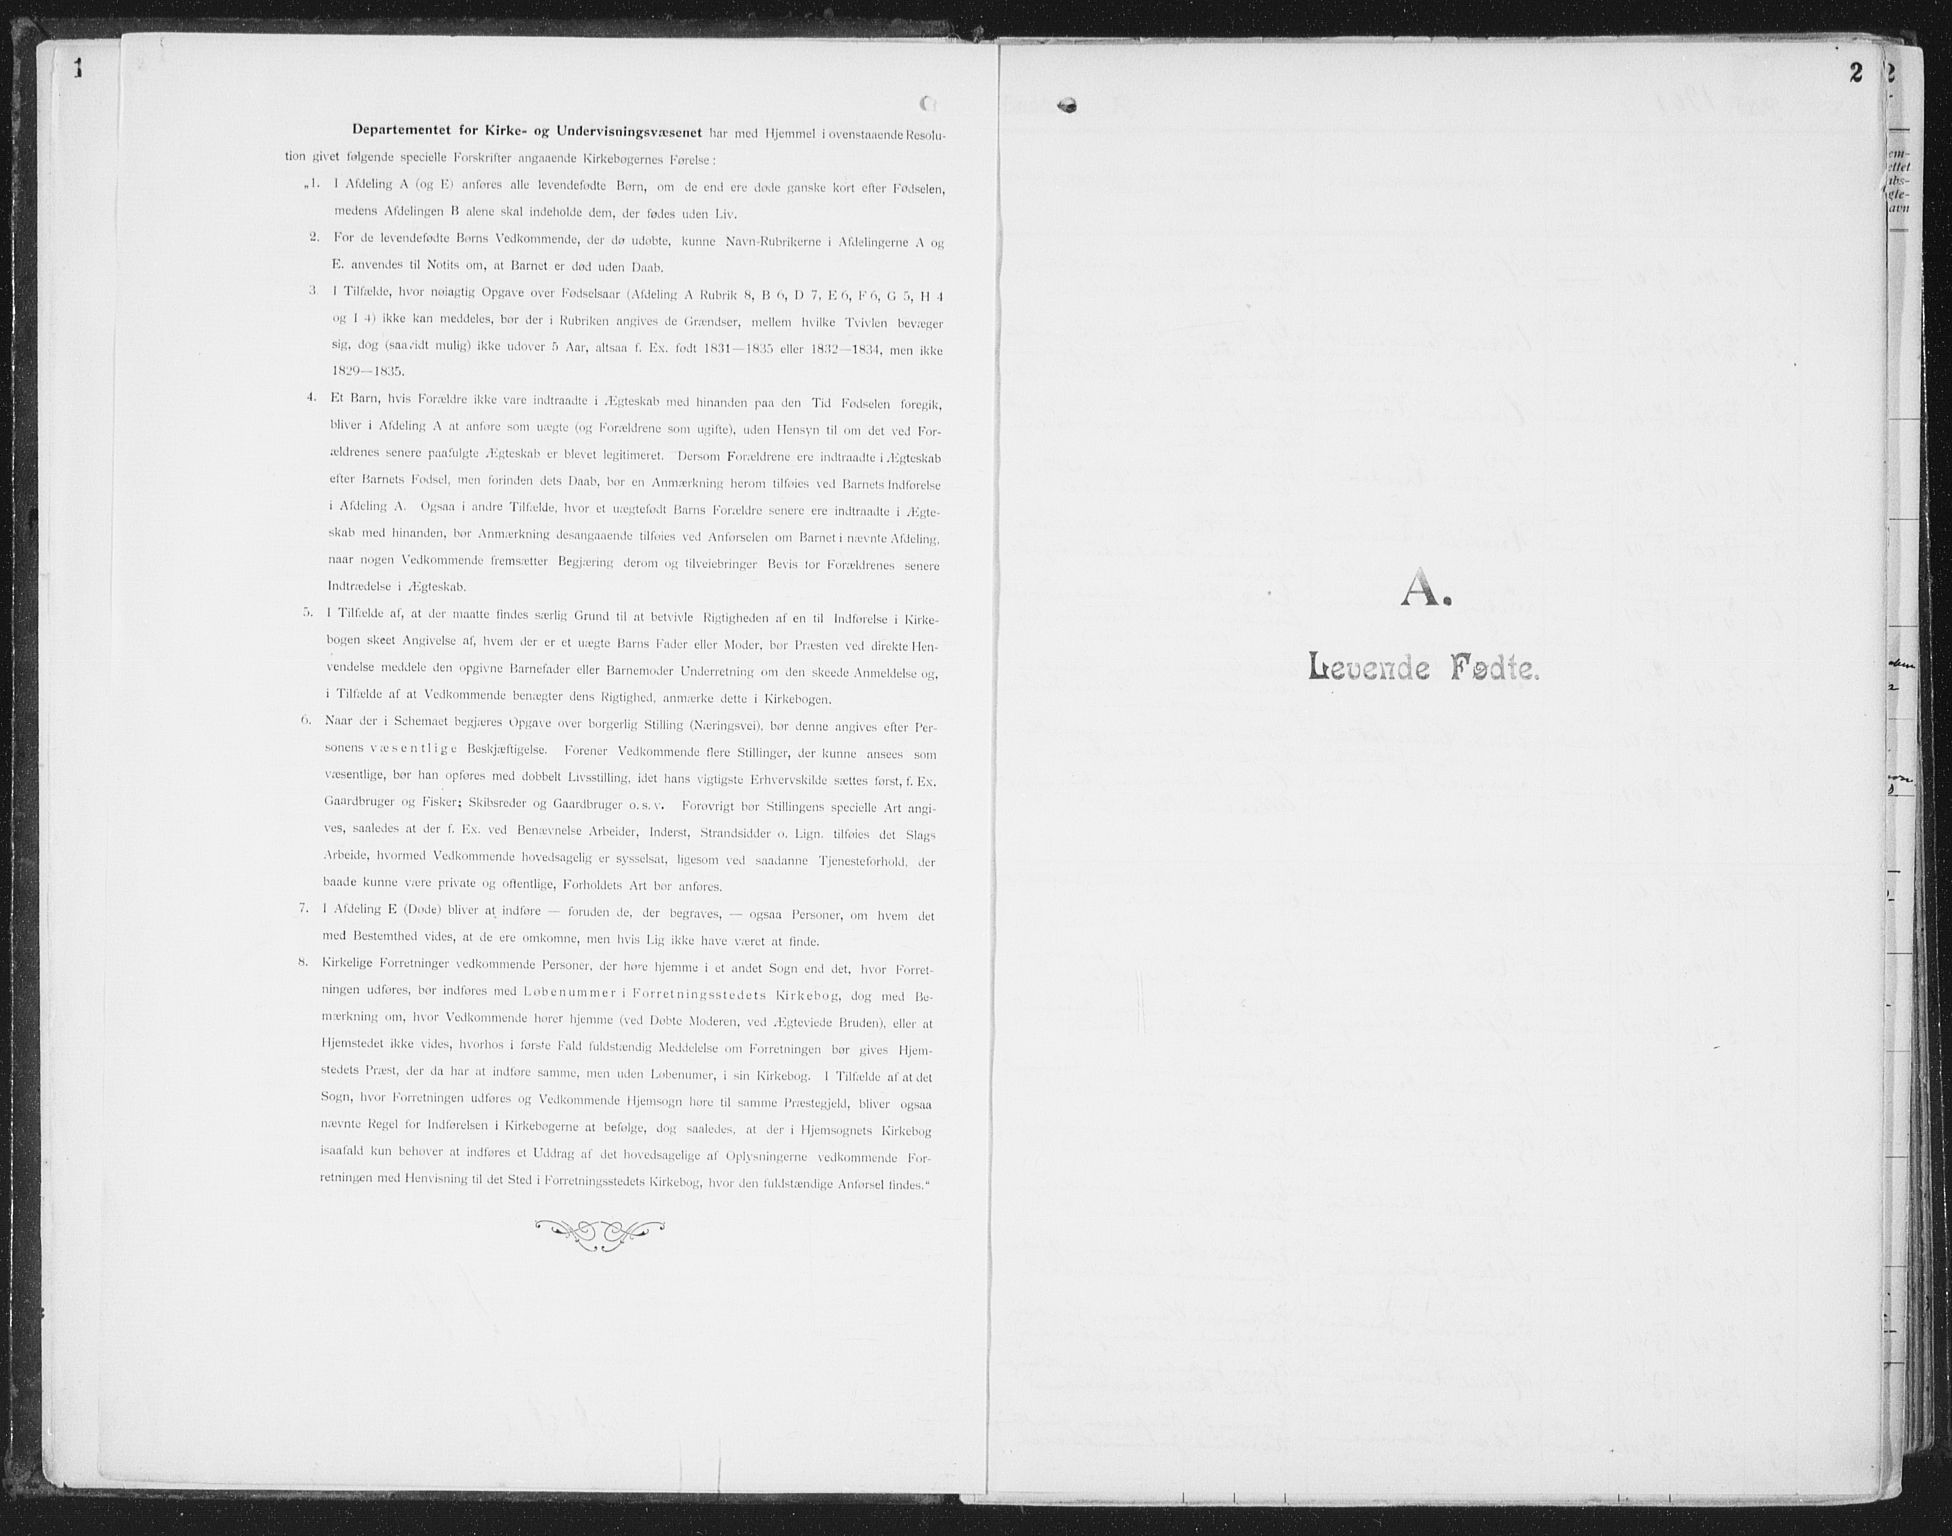 SAT, Ministerialprotokoller, klokkerbøker og fødselsregistre - Nordland, 804/L0081: Ministerialbok nr. 804A02, 1901-1915, s. 2